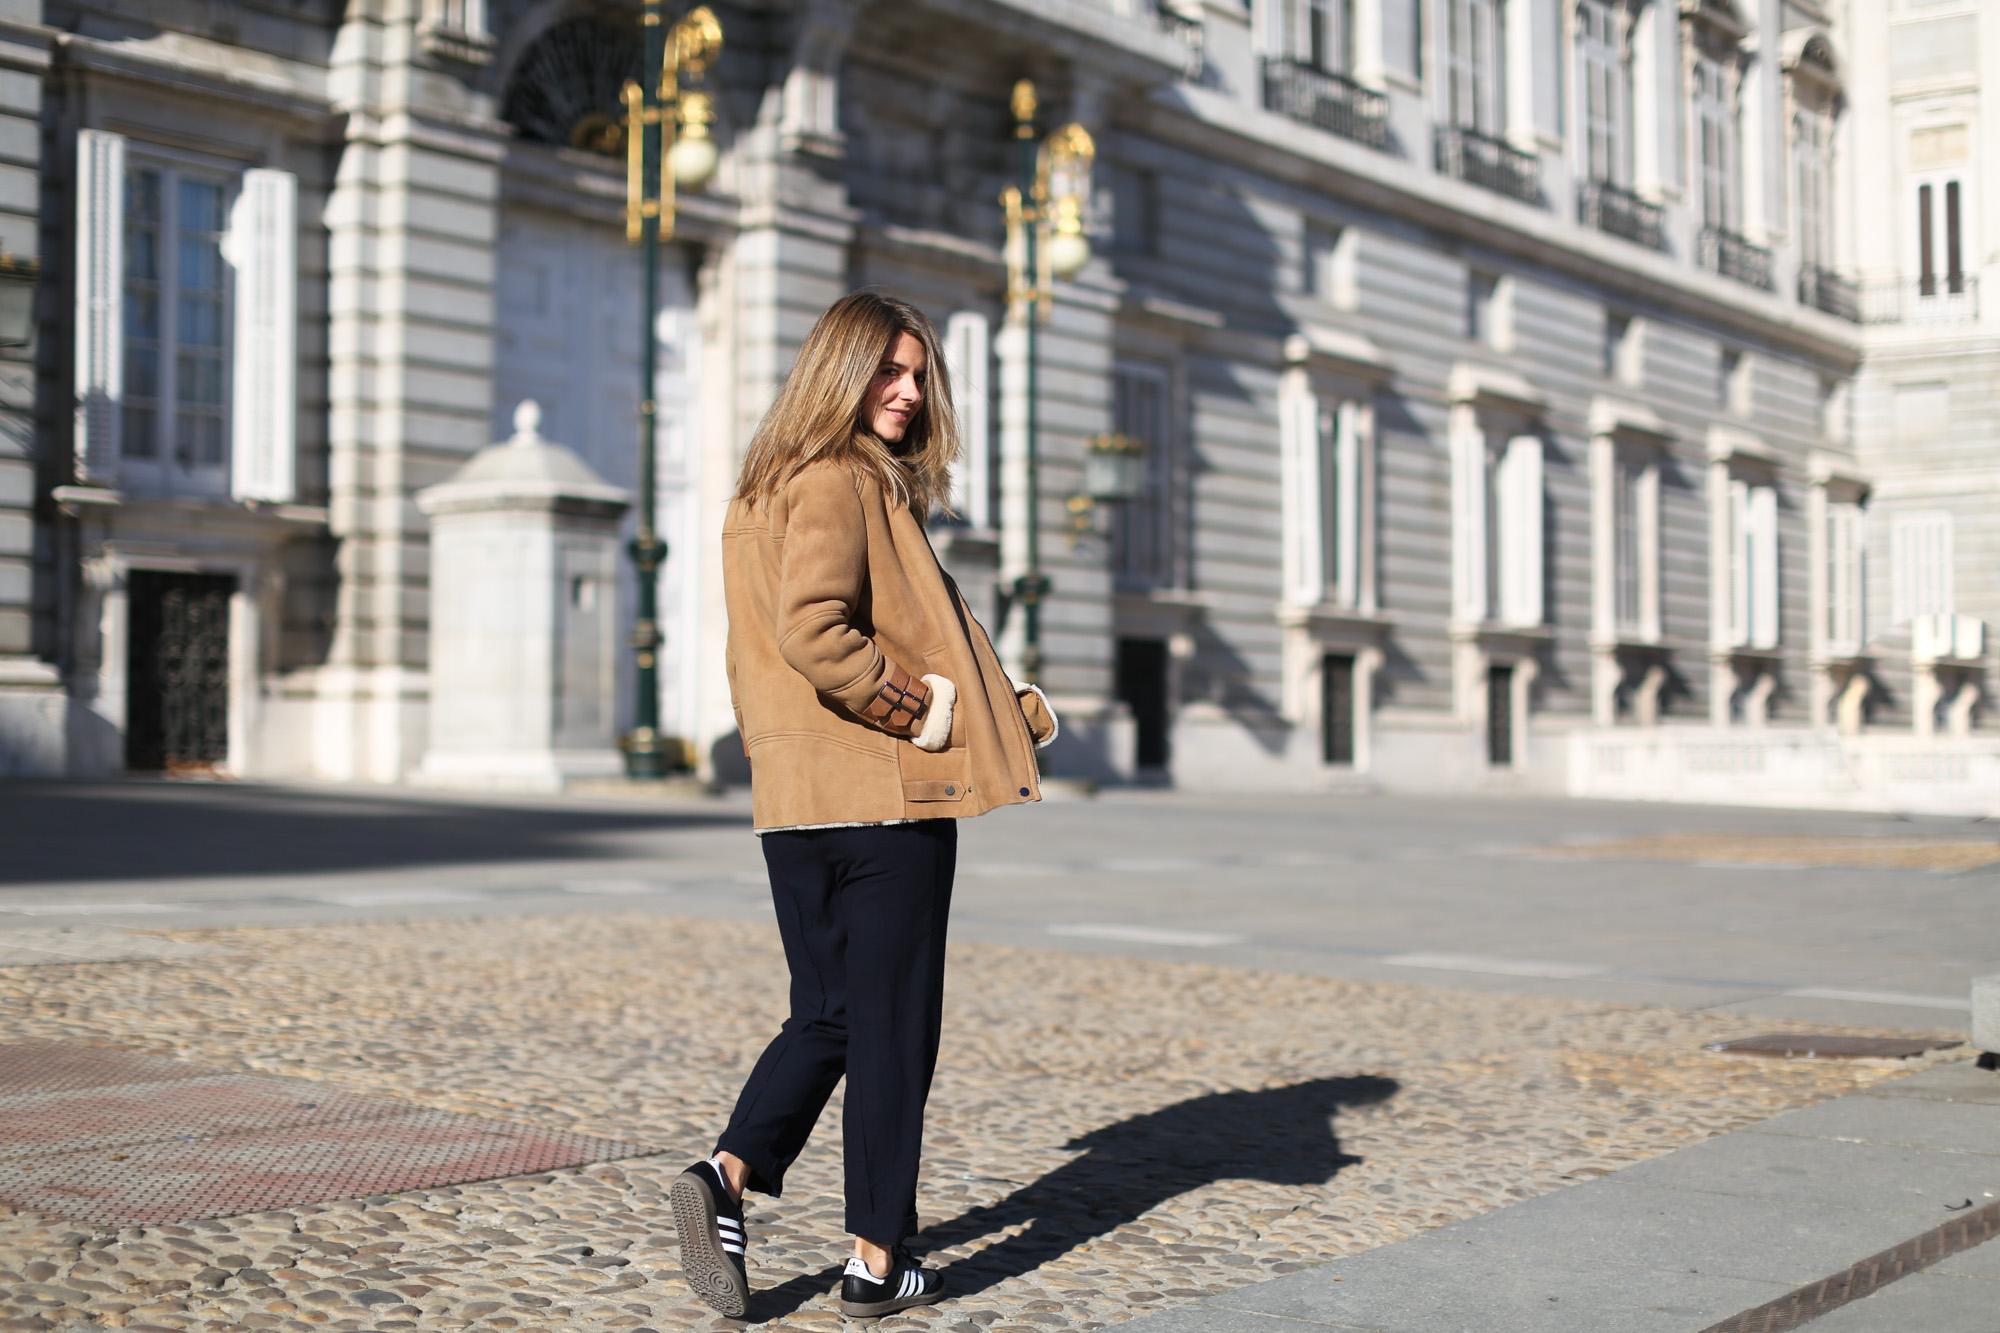 Clochet_streetstyle_mango_suede_leather_aviator_coat_adidas_samba_leztinstreet-7